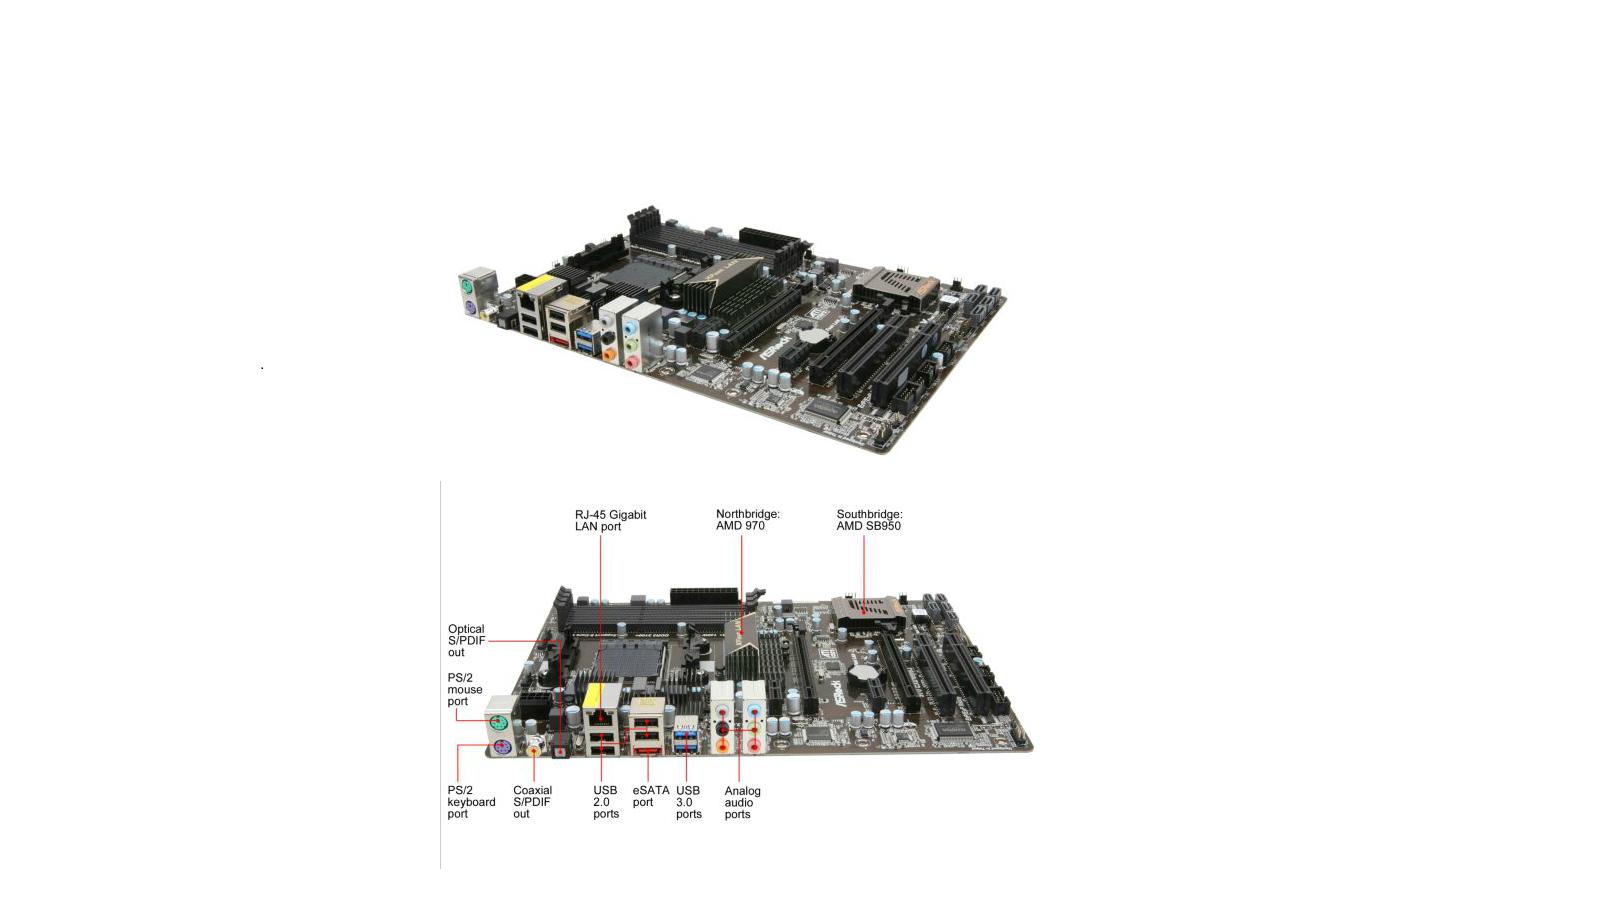 easy computer service company  asrock 970 extreme3 am3  amd 970 sata 6gb  s usb 3 0 atx amd